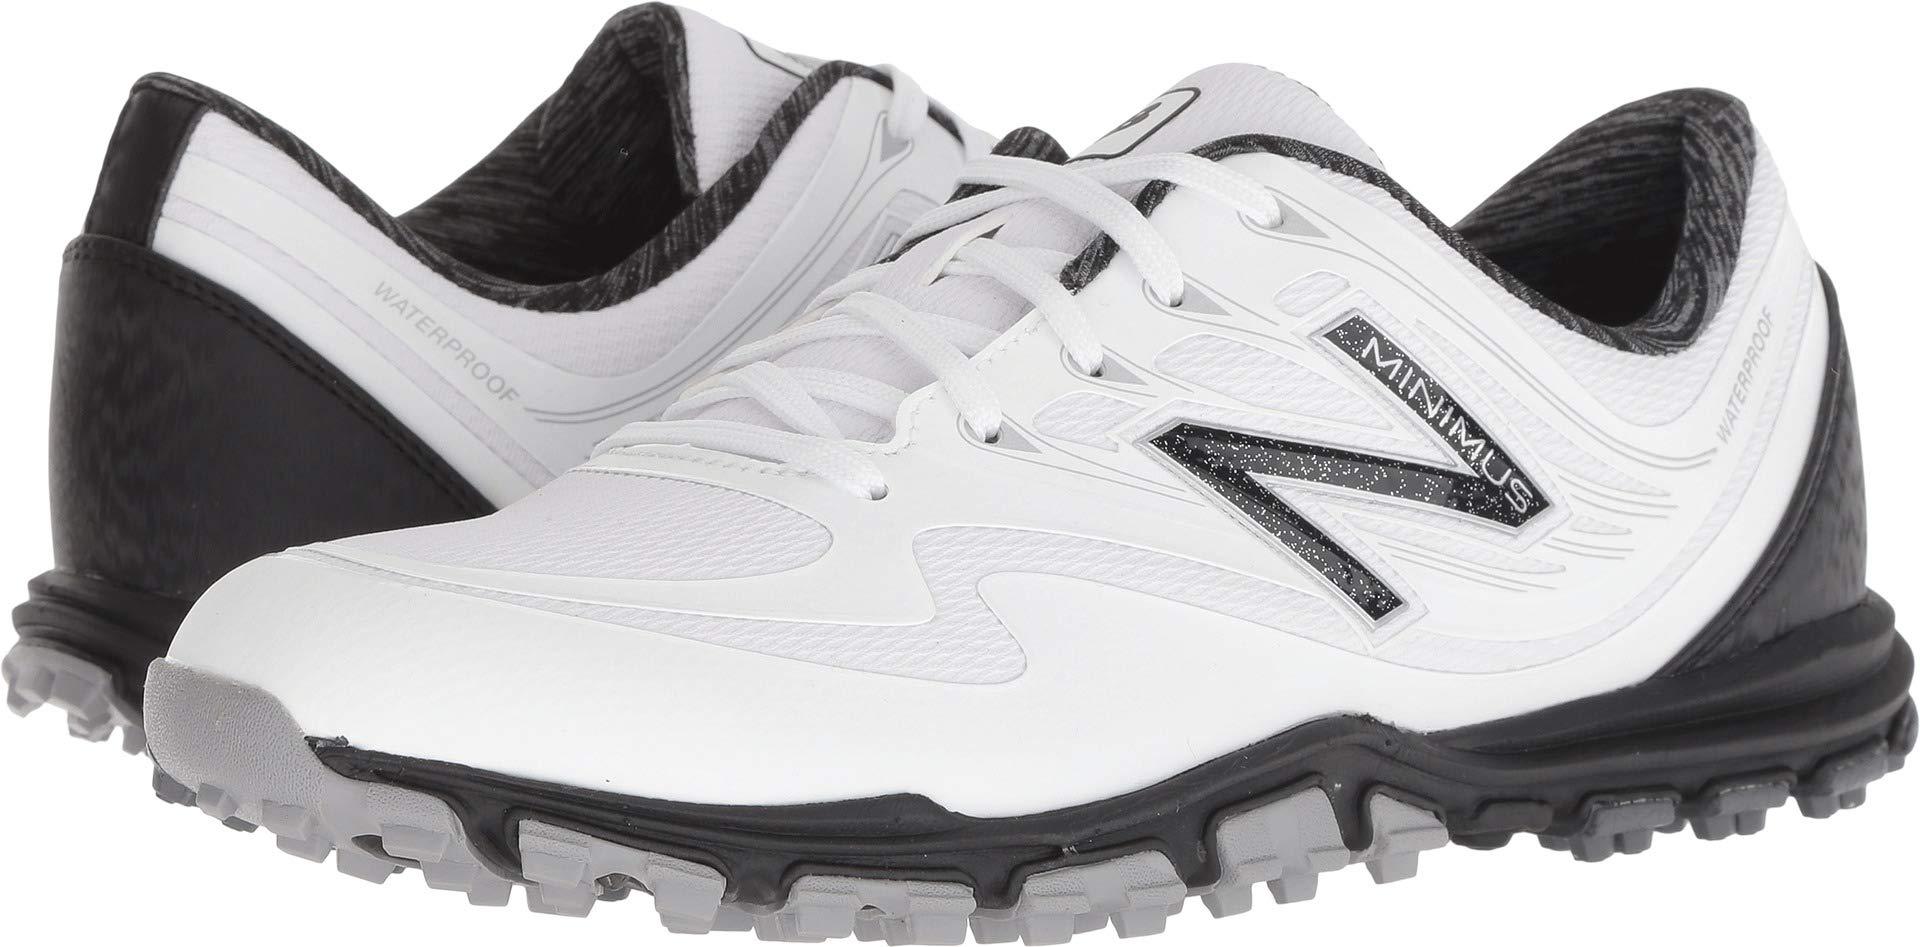 New Balance Women's Minimus WP Waterproof Spikeless Comfort Golf Shoe, White/Black, 6.5 M US